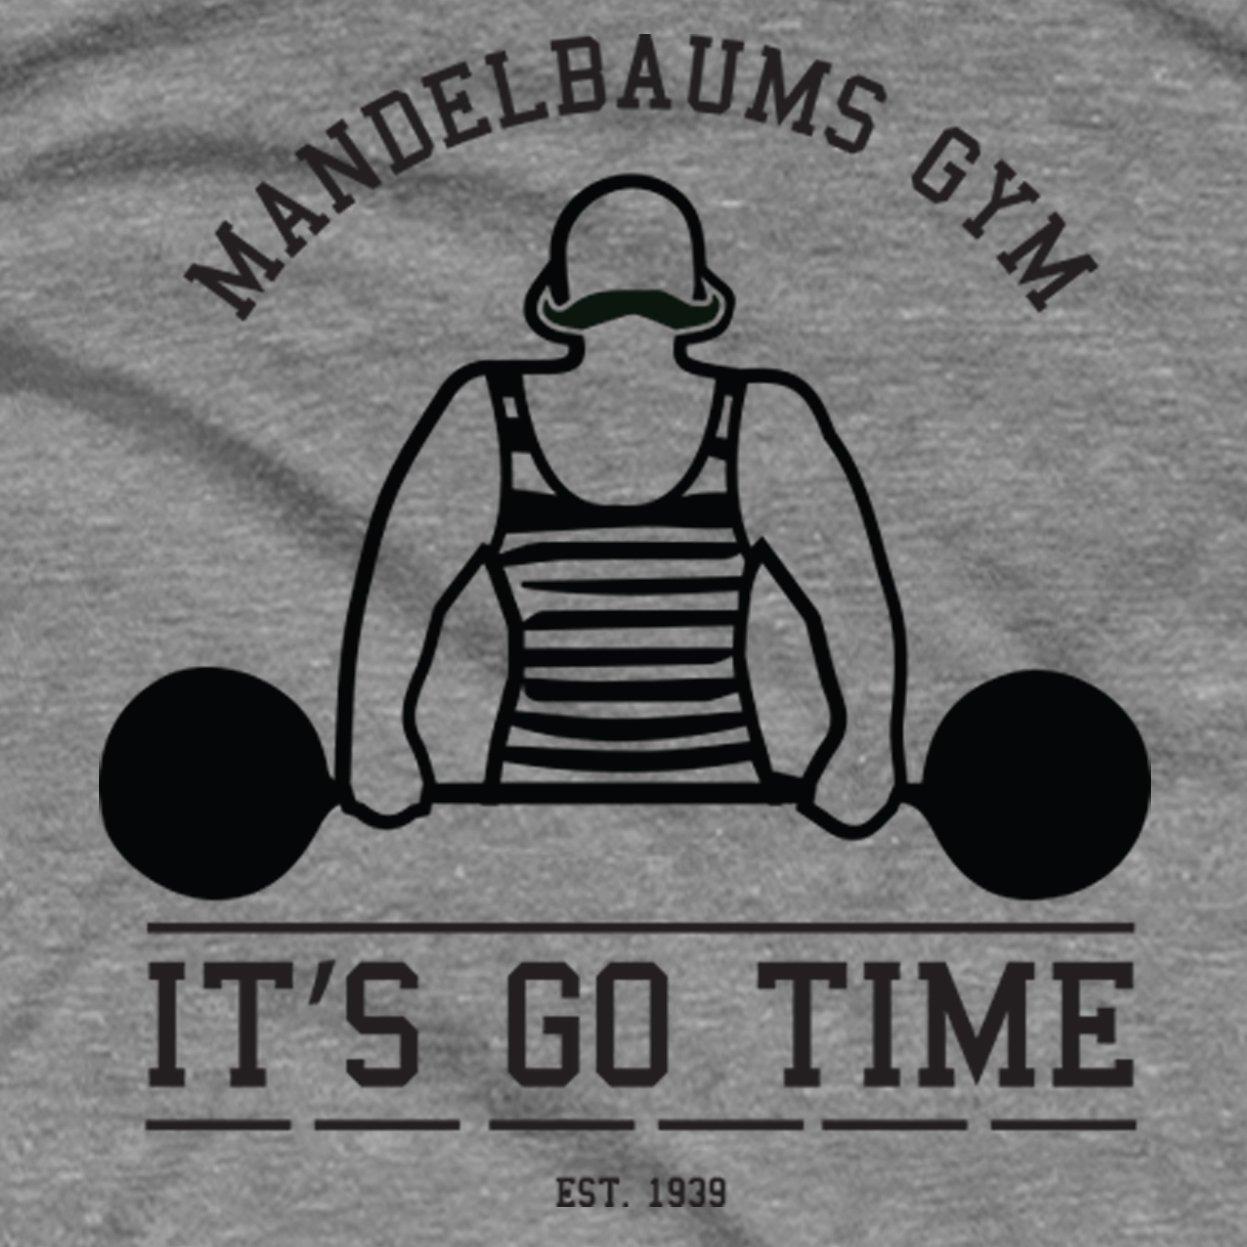 Mandelbaum's Gym T-Shirt